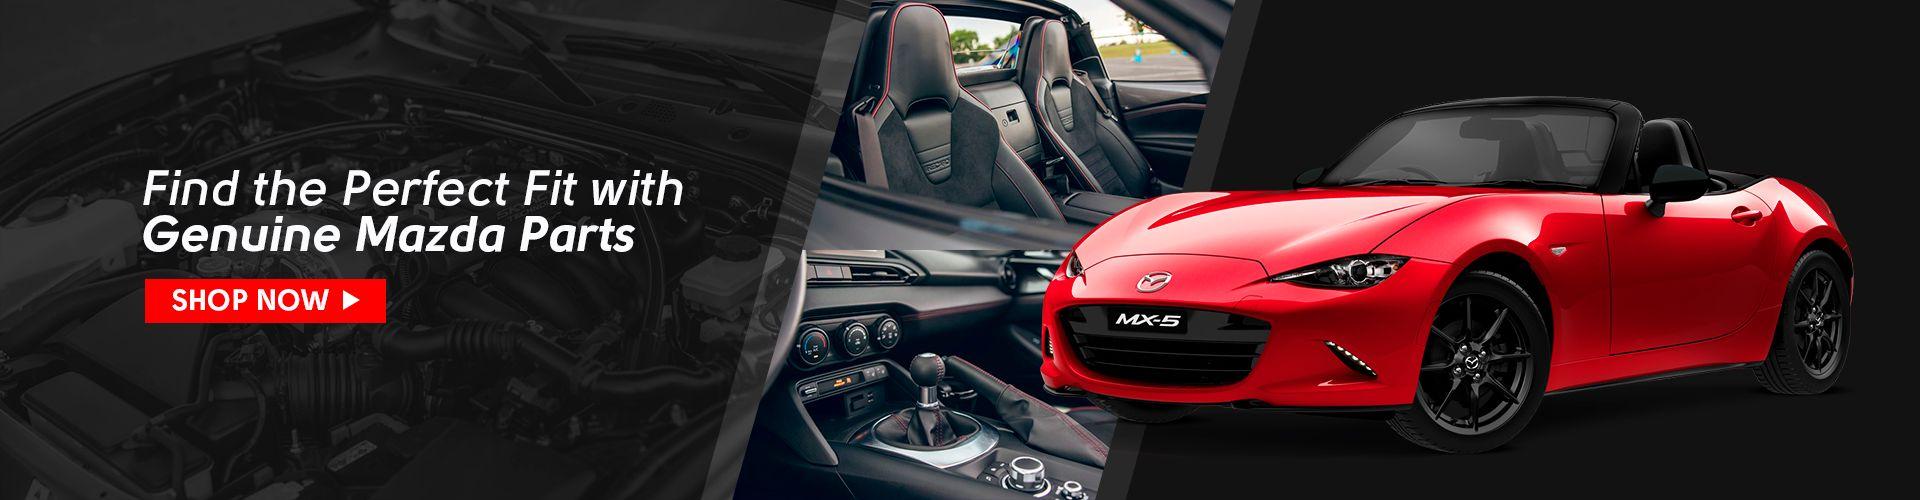 Shop Genuine Mazda Parts and Accessories